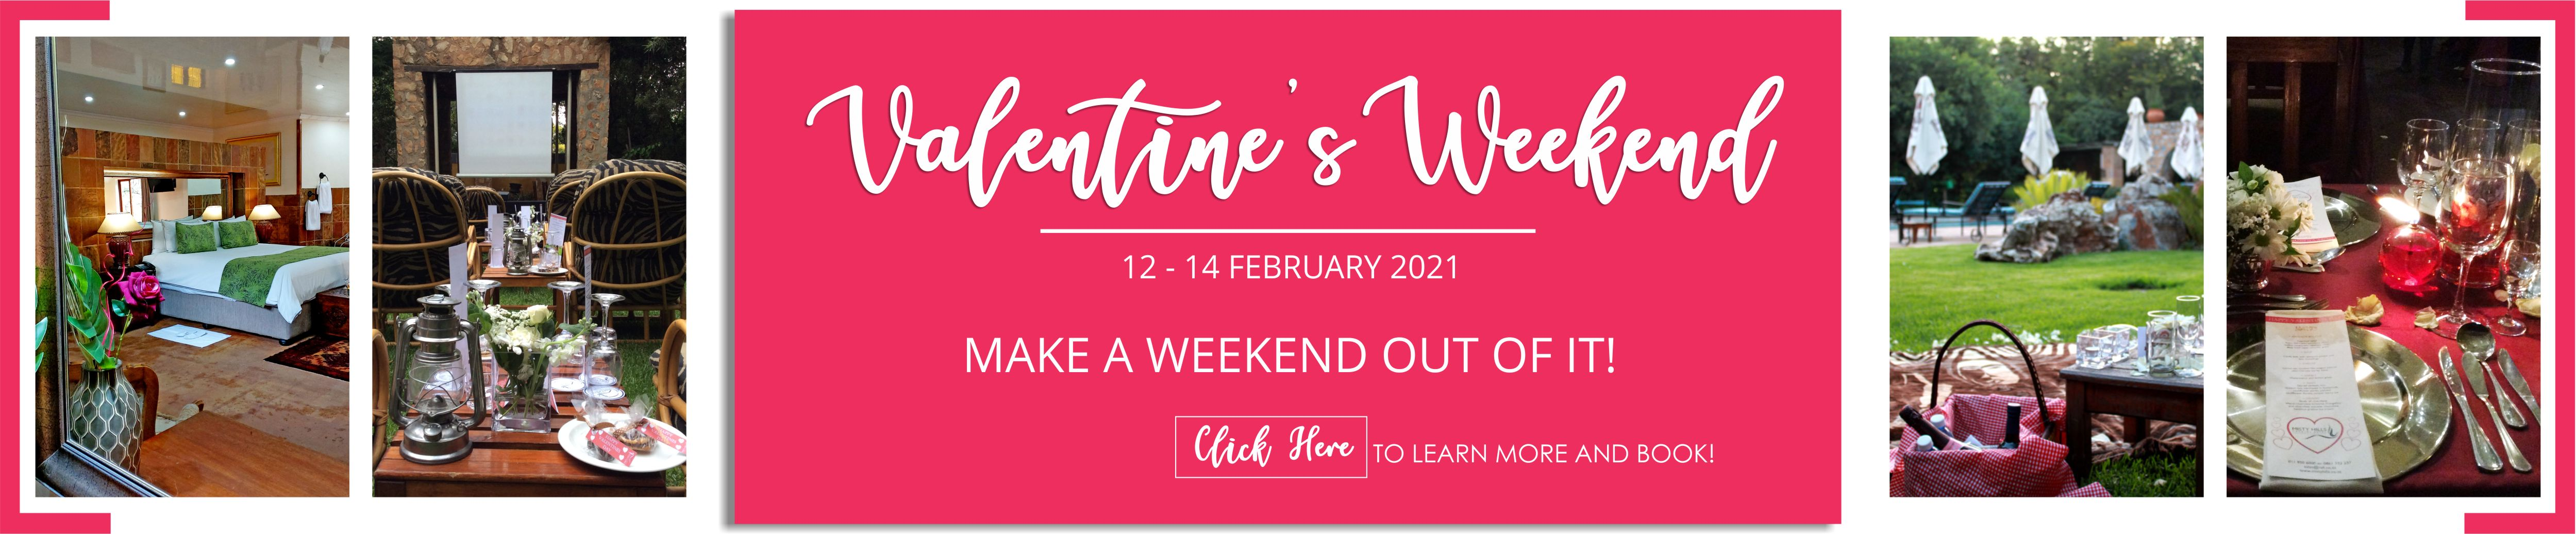 Misty Hills Country Valentines Day Picnic and Dinner Specials Gauteng Muldersdrift restaurants